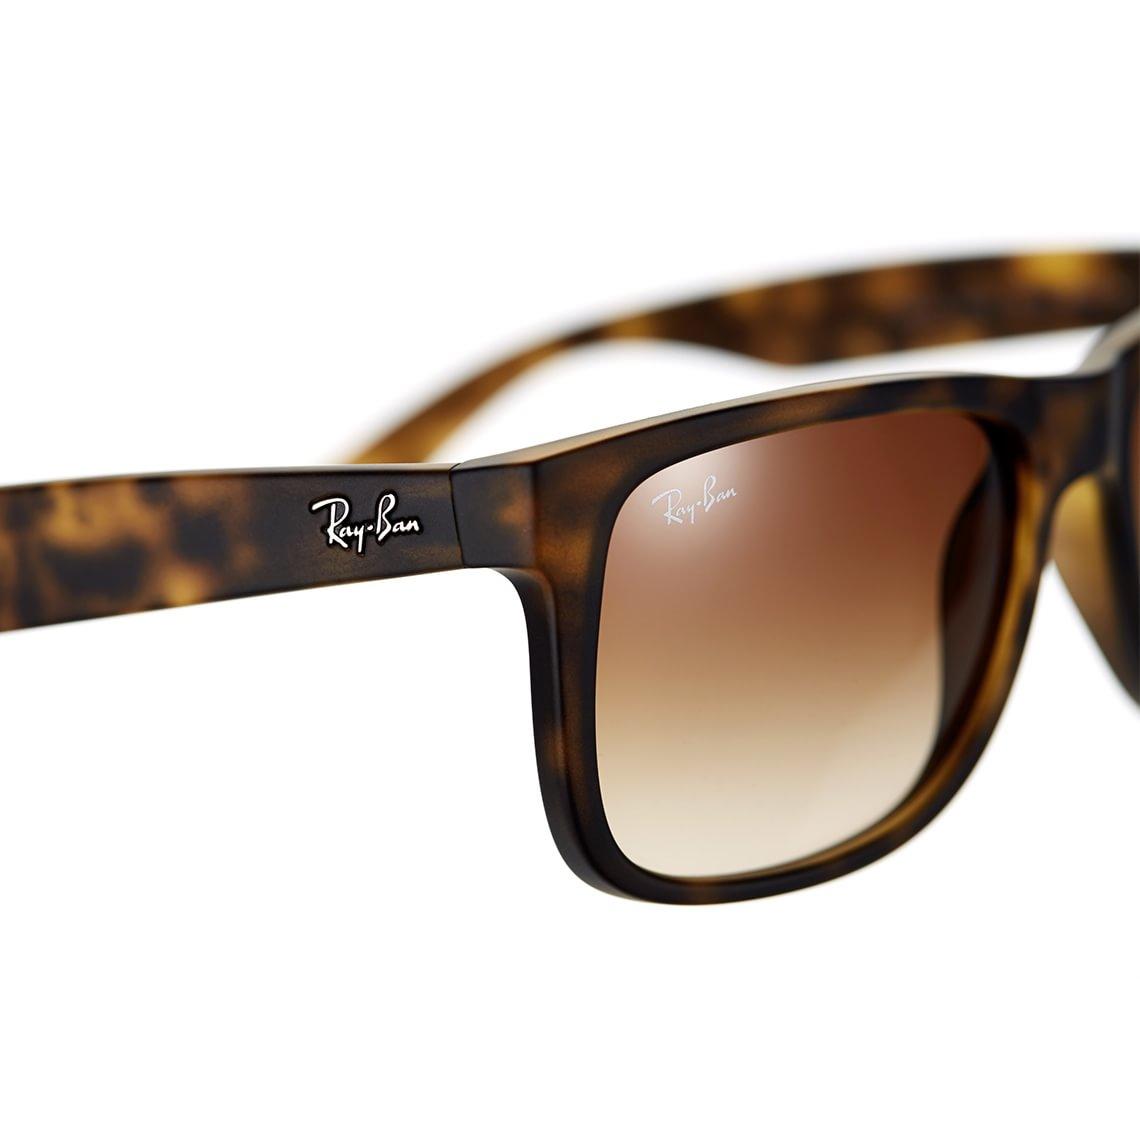 ce7ac351c5 Ray-Ban Justin RB4165 710 13 55 - Profil Optik